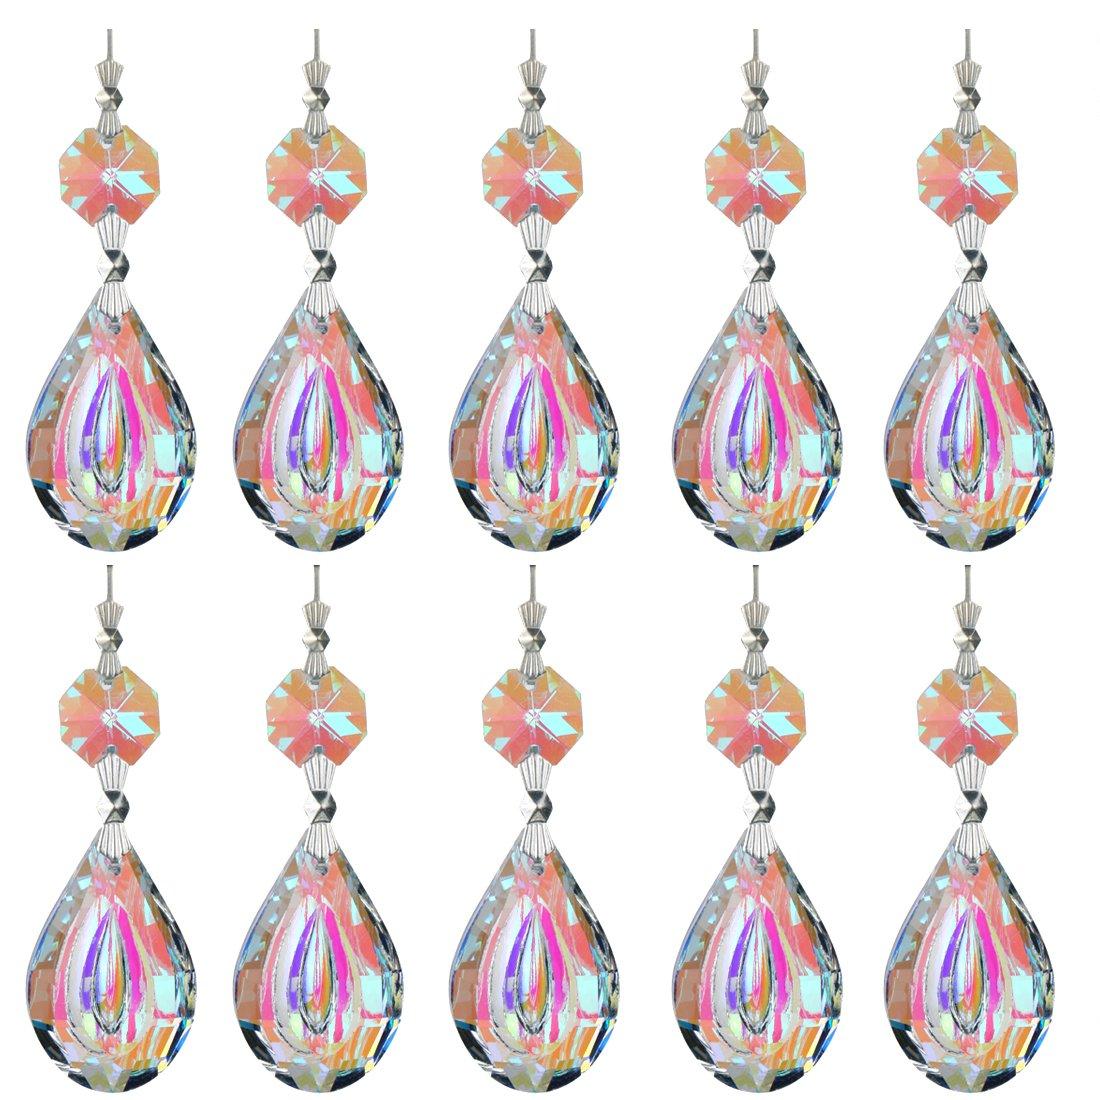 H/&D Colorful Lamp Prisms Parts 38mm Loquat Shape with Octagon Bead Chandelier Glass Crystals Hanging Drops Pendants Color-10pcs